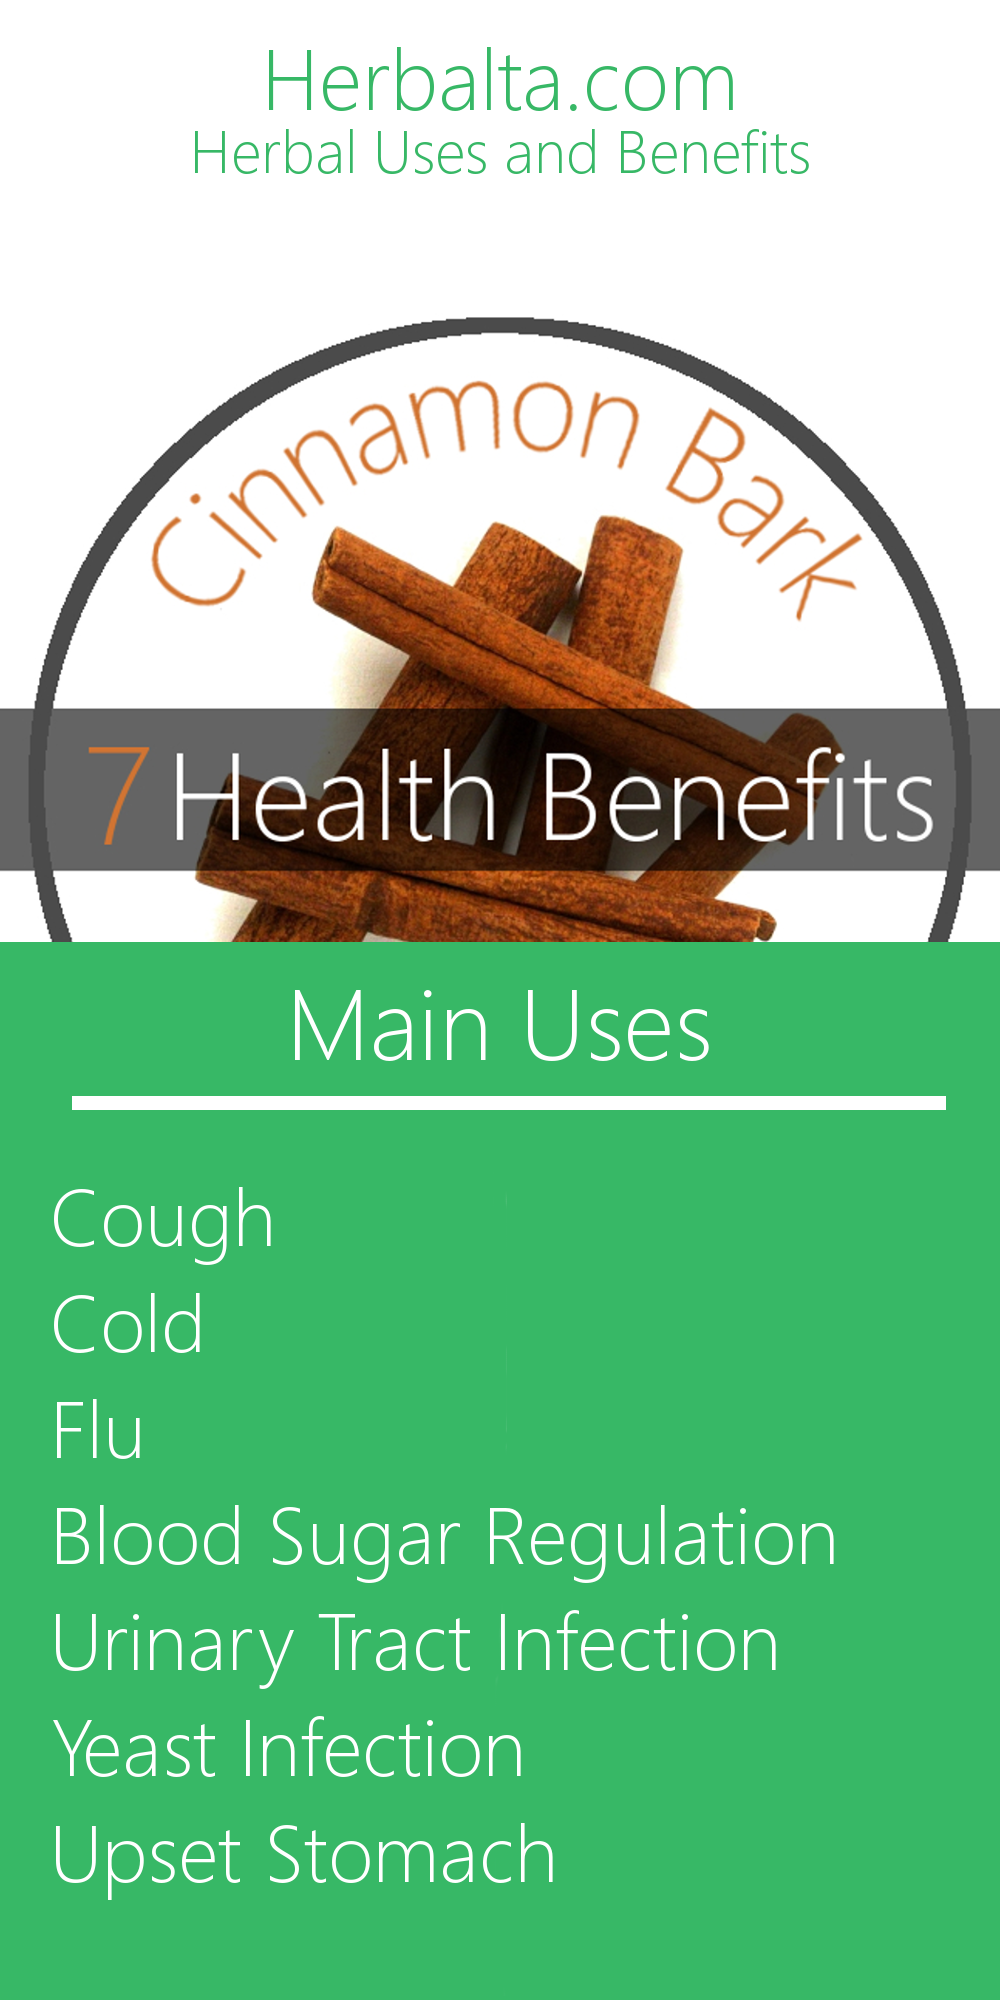 Cinnamon - Cinnamon bark effectively helps regulate blood sugar in people with type 2…